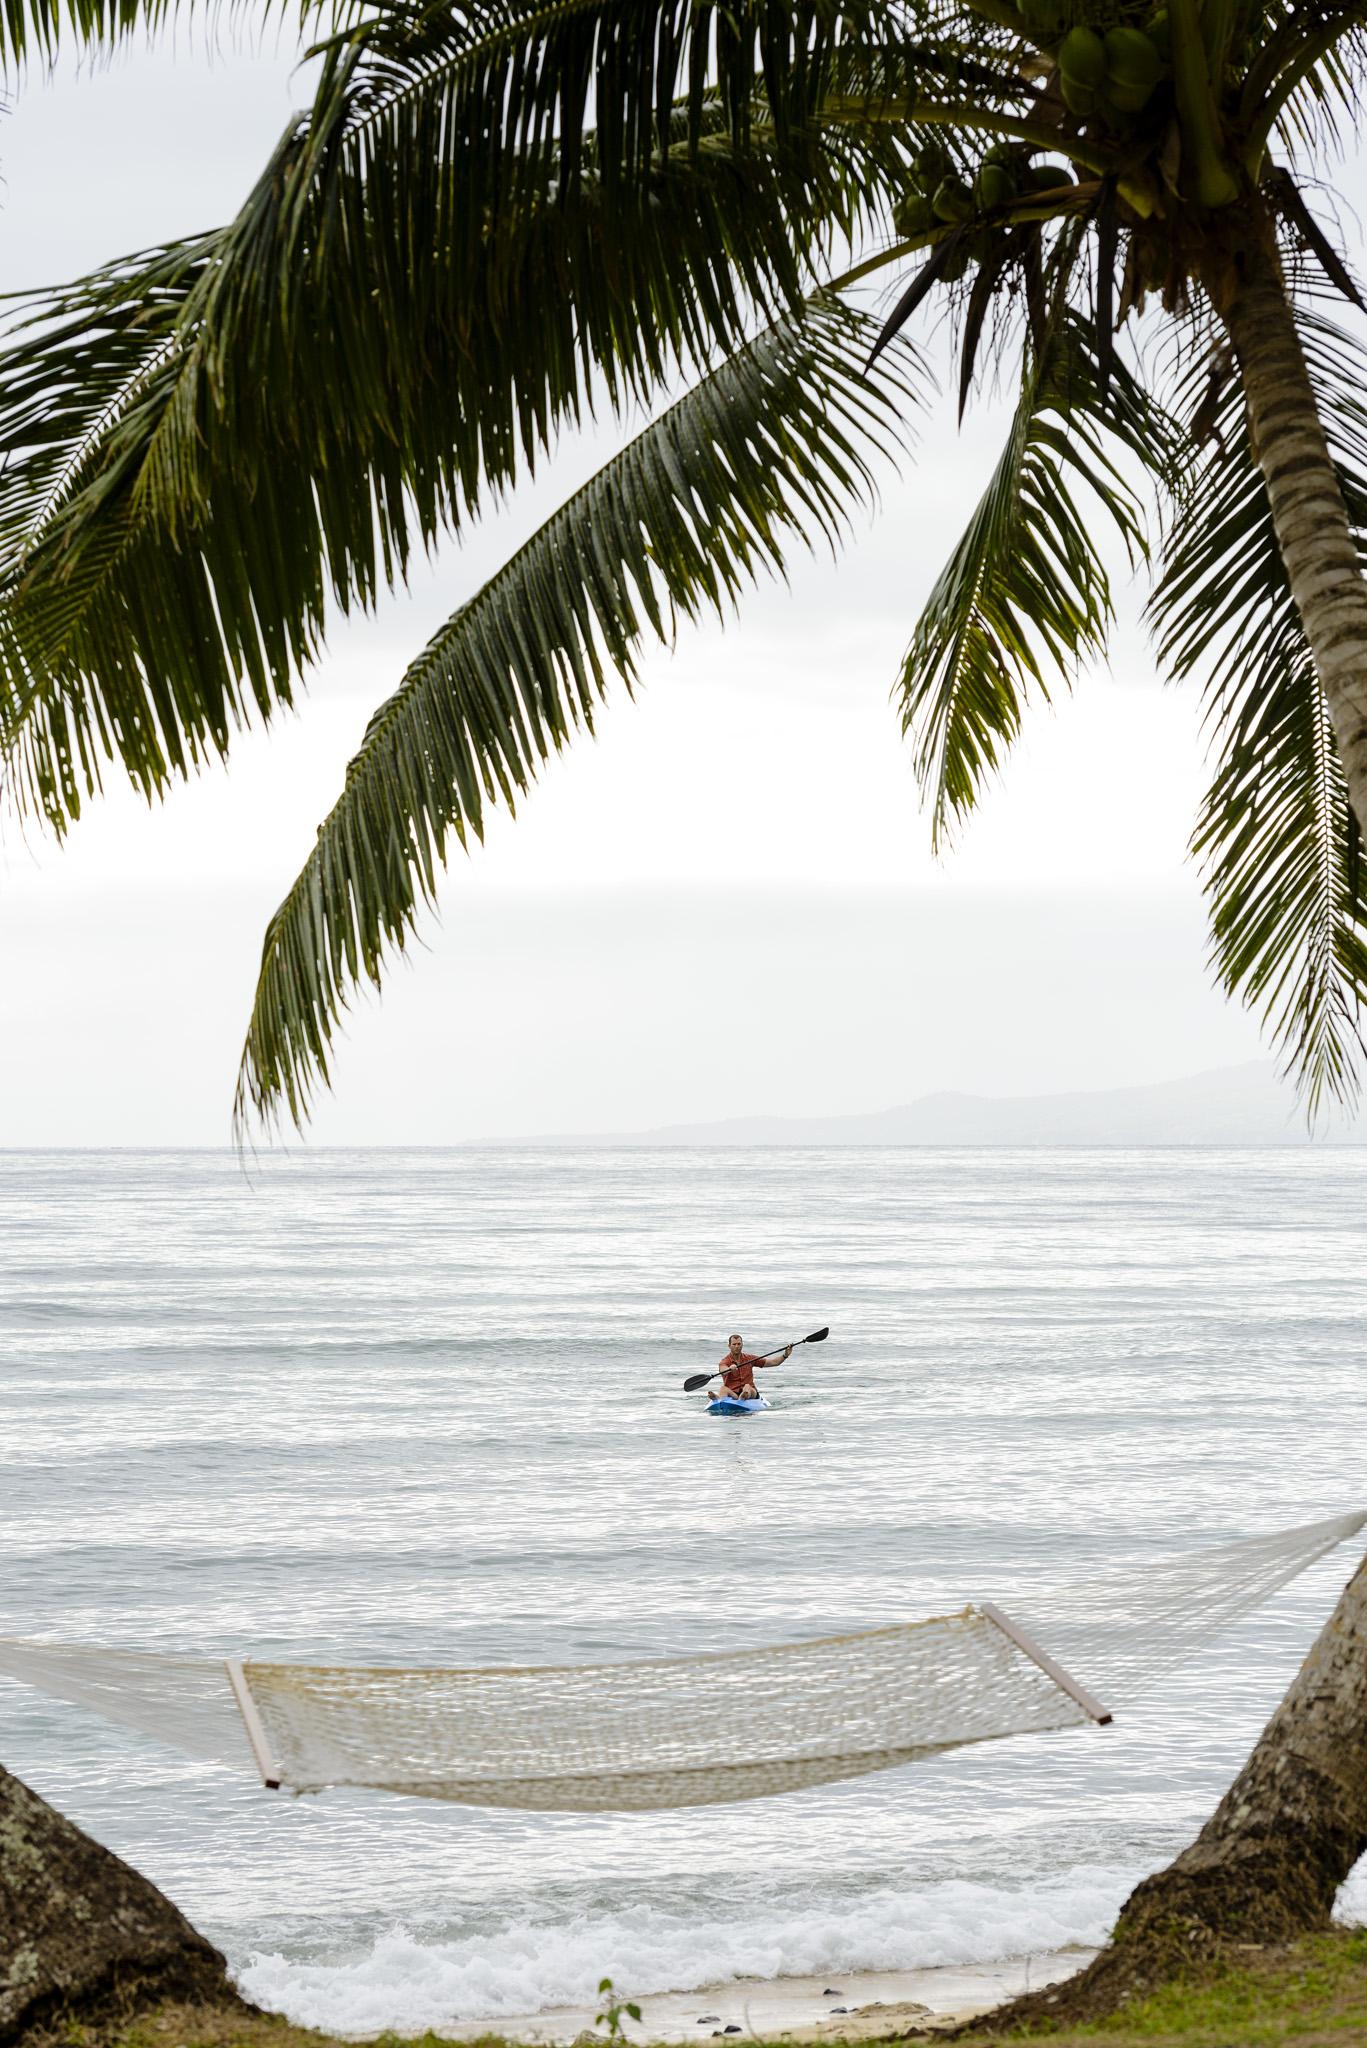 Kayak and Hammock- The Remote Resort Fiji Islands - Boutique Luxury Fiji Resort